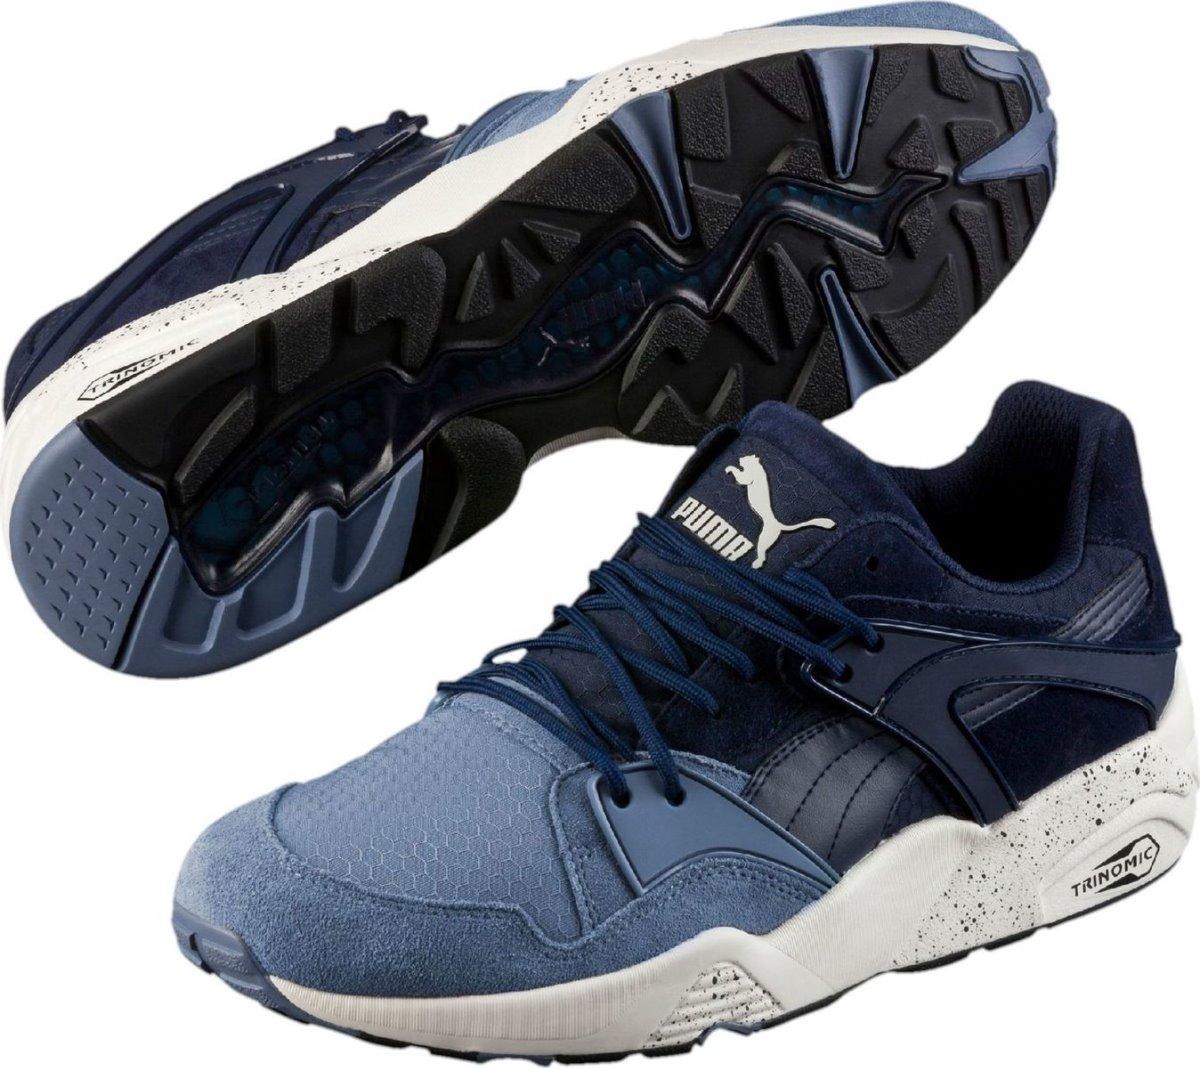 sale retailer 12ef6 64267 Tenis Puma Trinomic Blaze Of Glory Blue/blue Nasotafi2